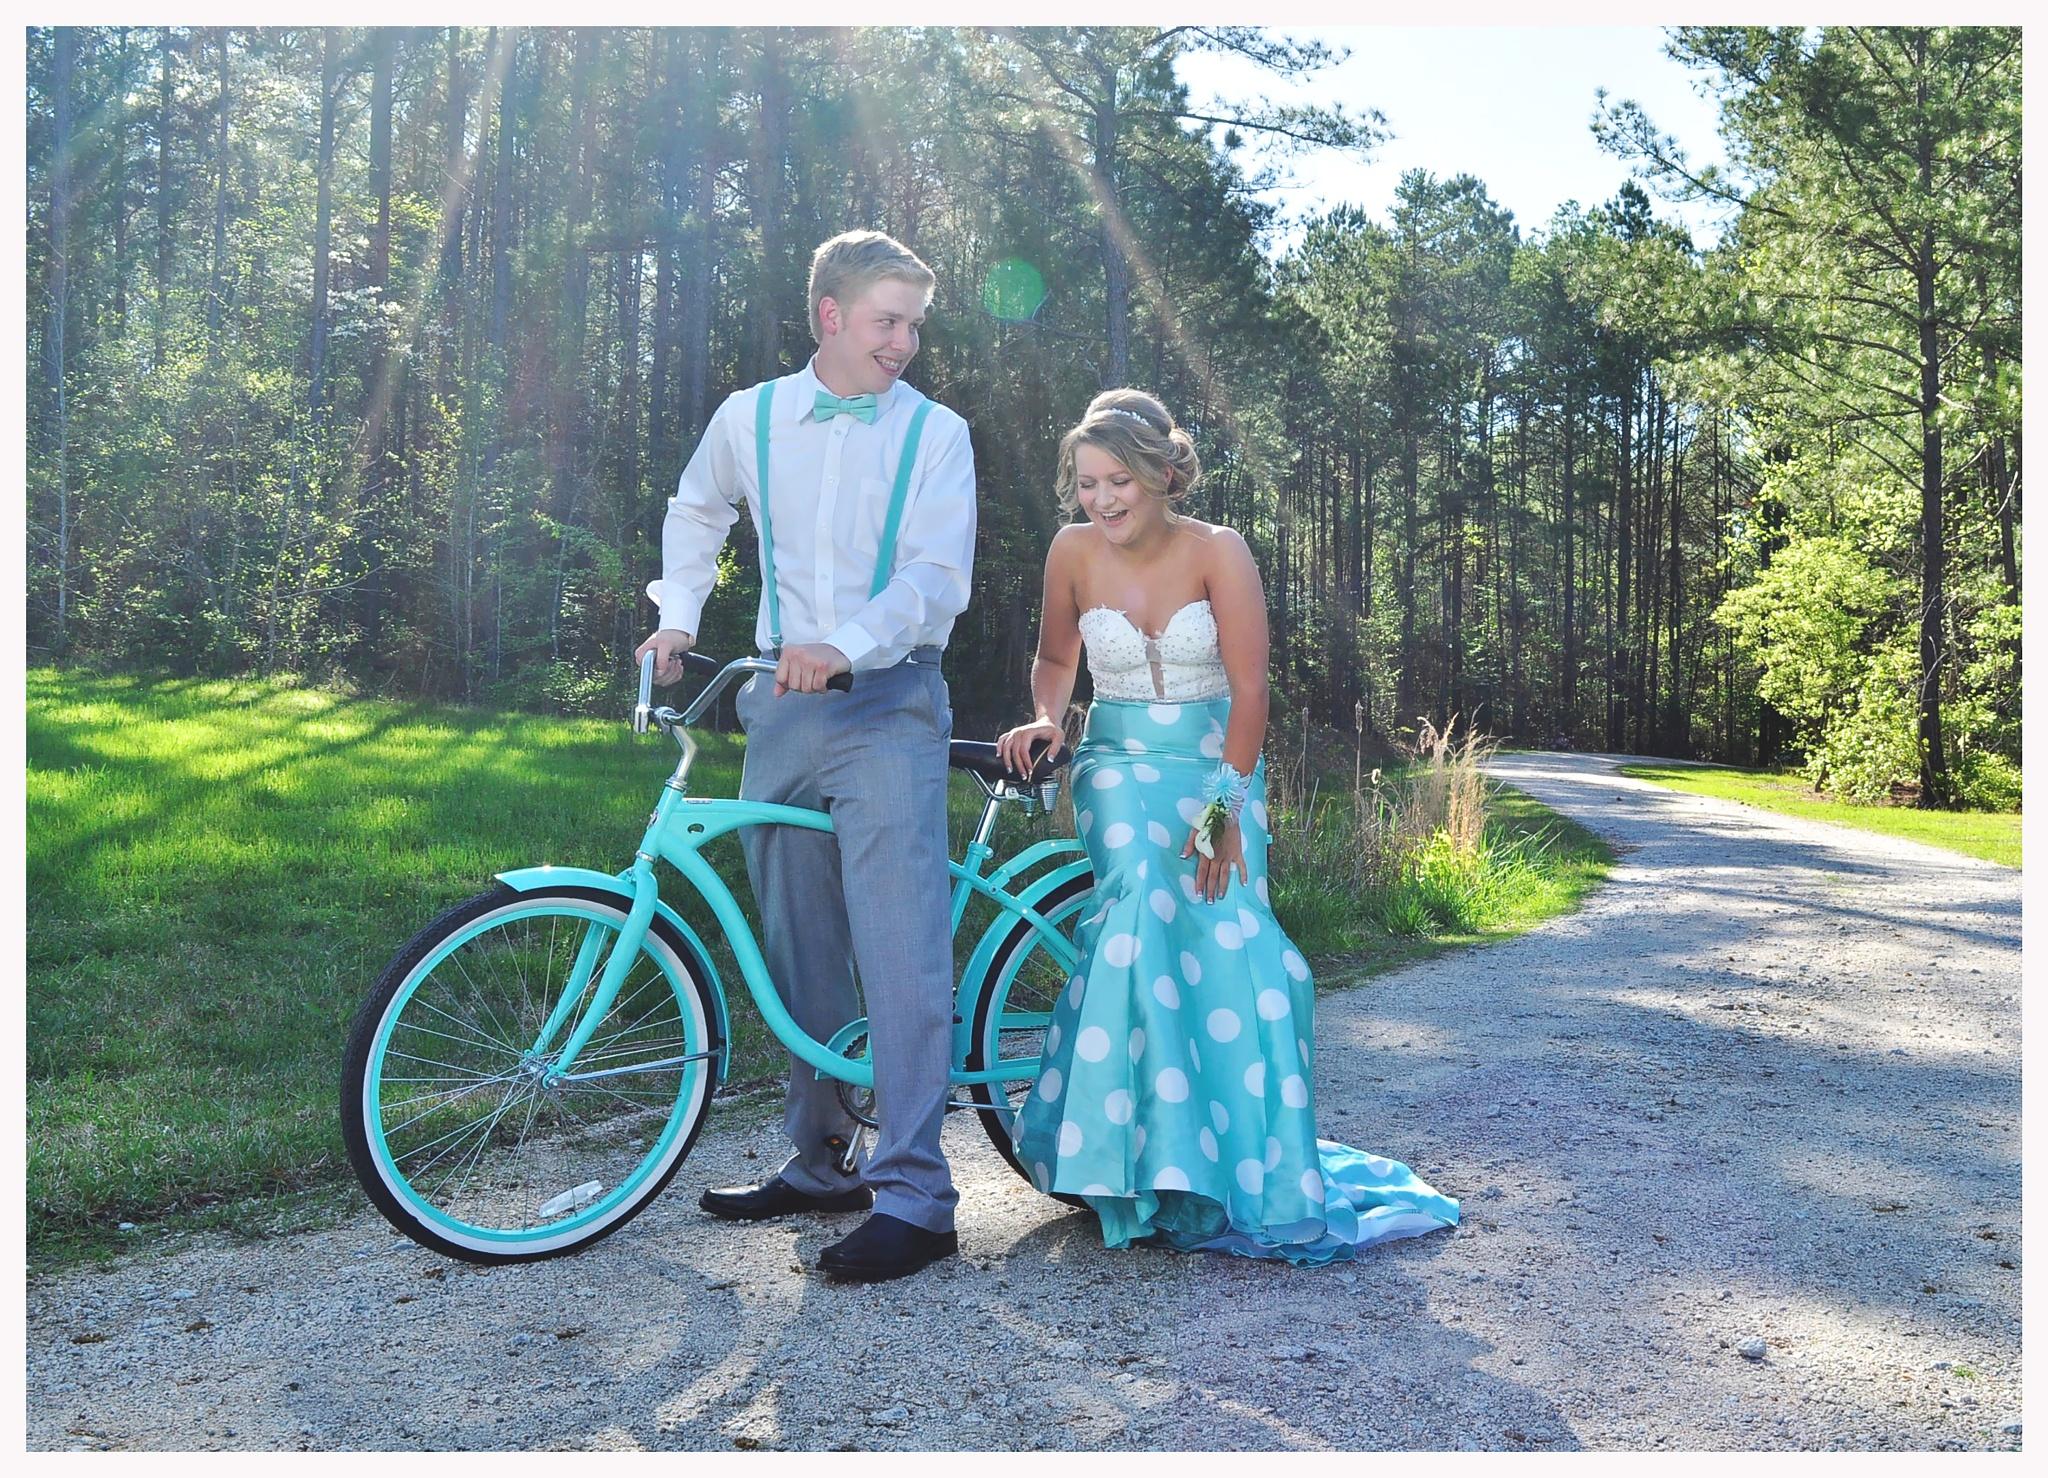 Bike Ride by Heather Greene